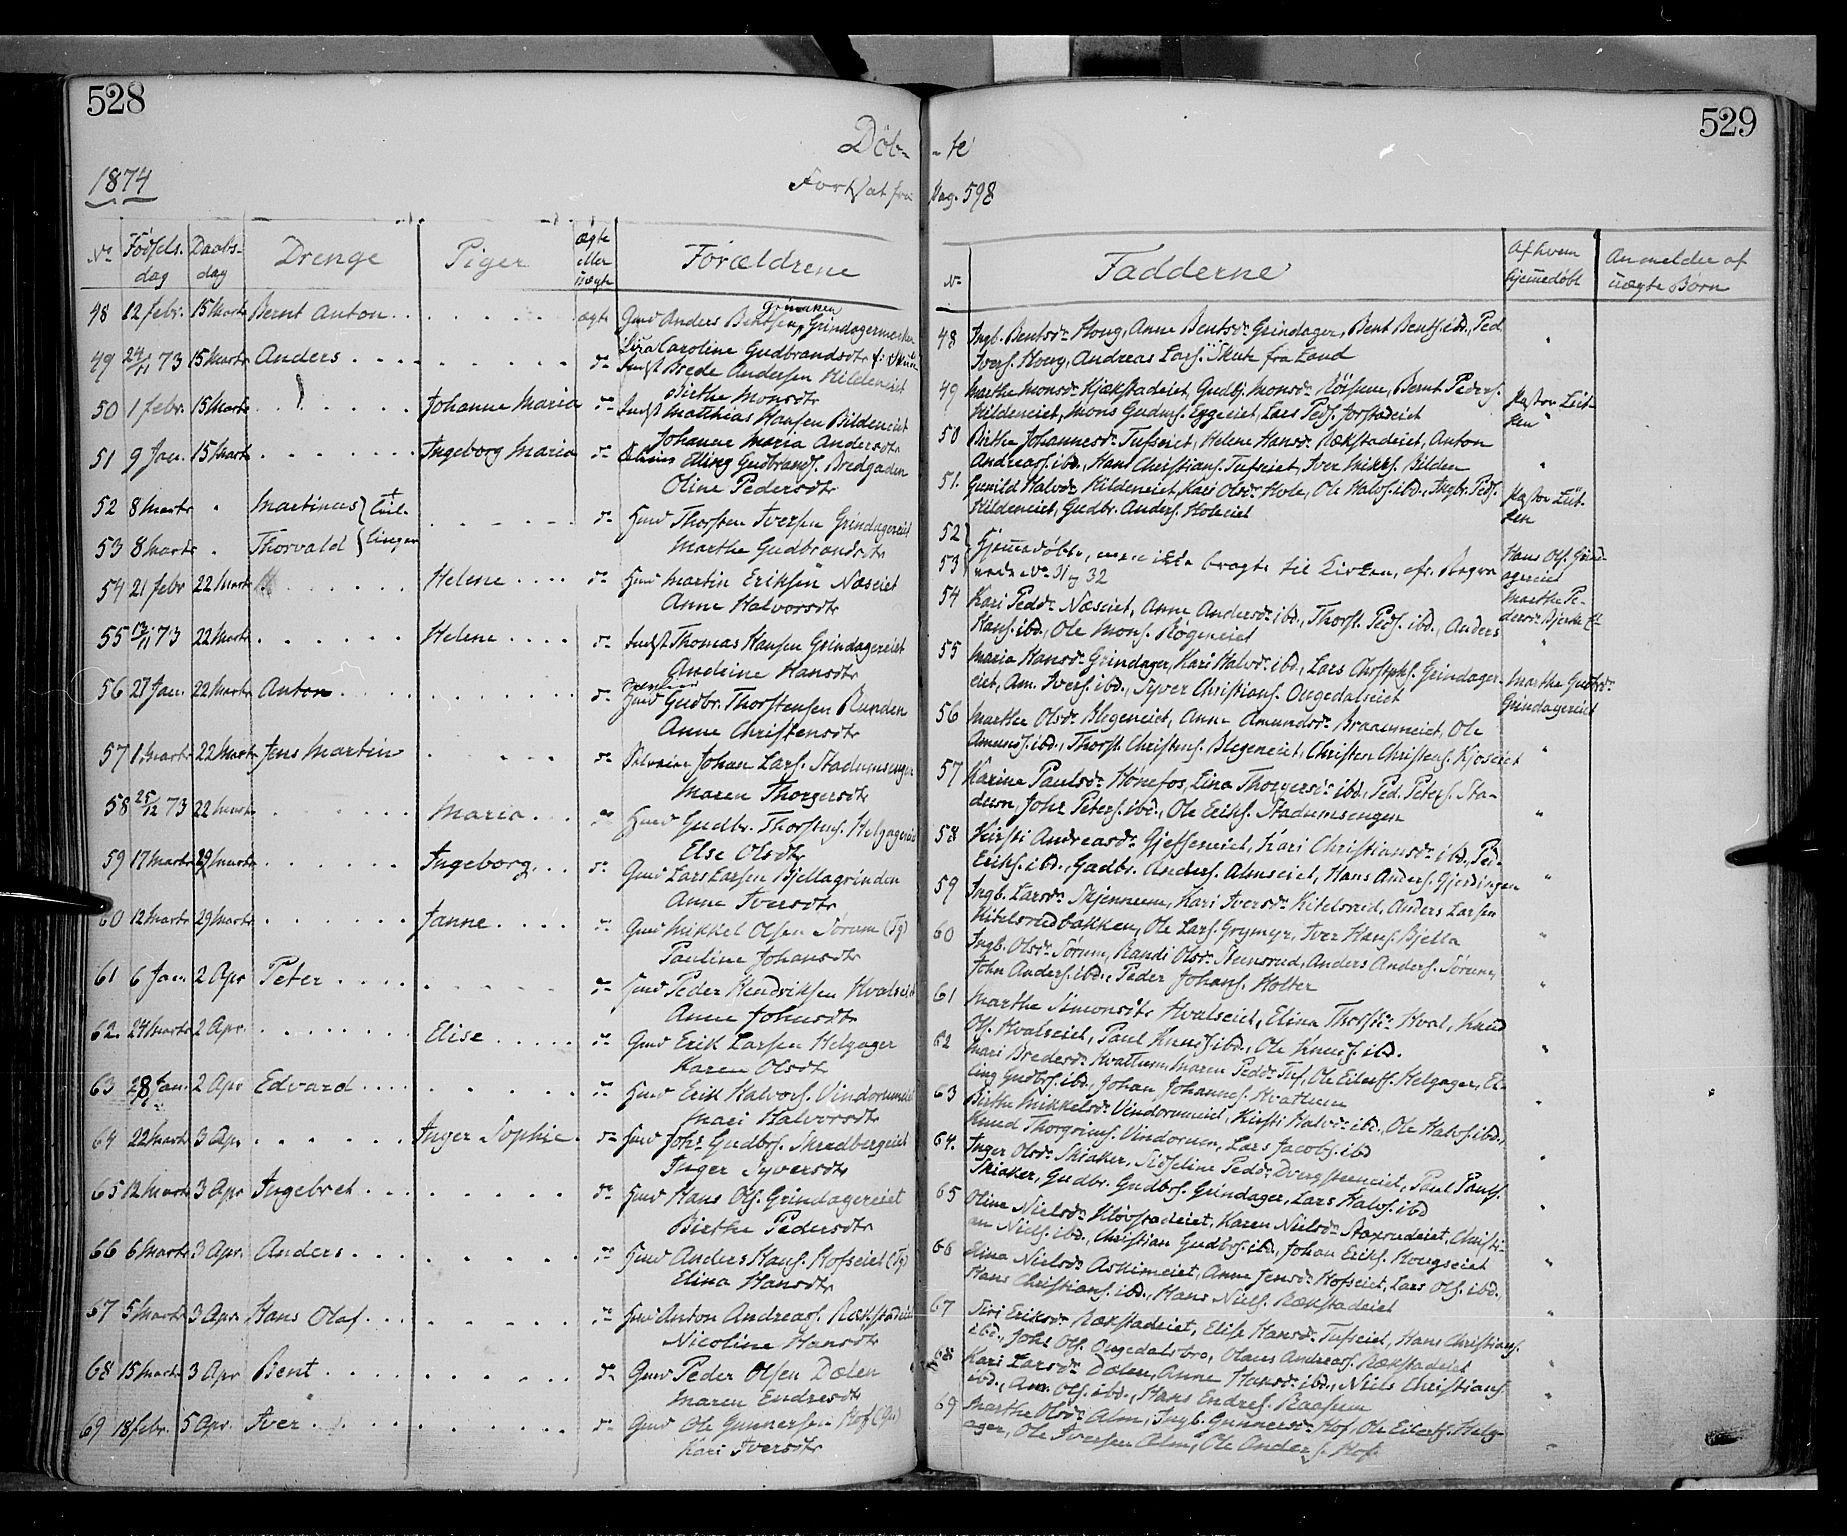 SAH, Gran prestekontor, Ministerialbok nr. 12, 1856-1874, s. 528-529